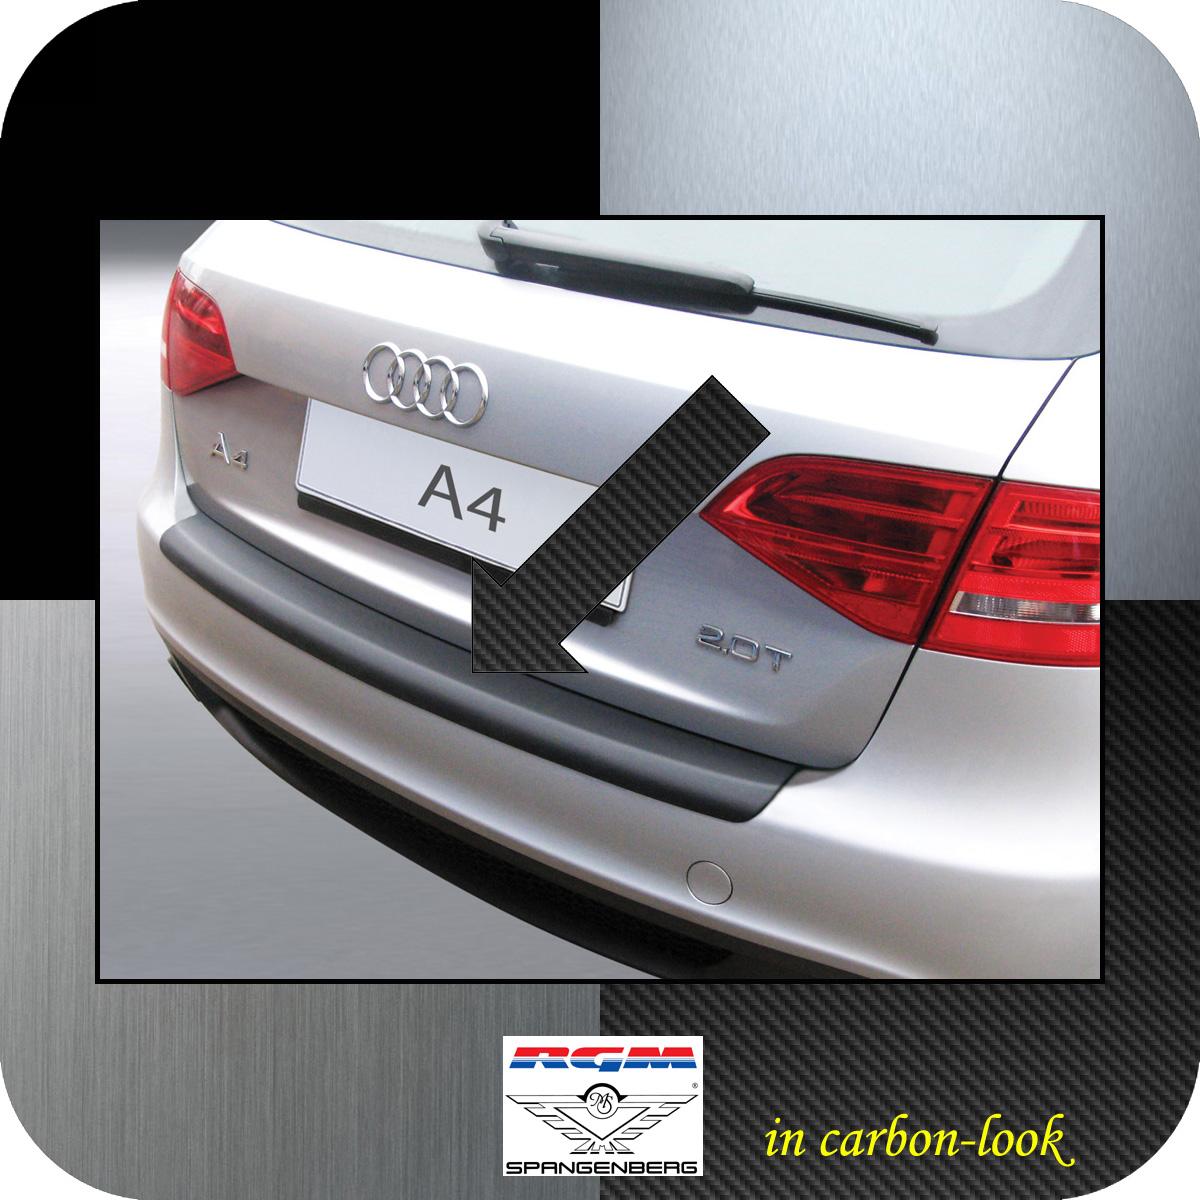 Ladekantenschutz Carbon-Look Audi A4 B8 Avant Kombi vor facelift 2008-11 3509159